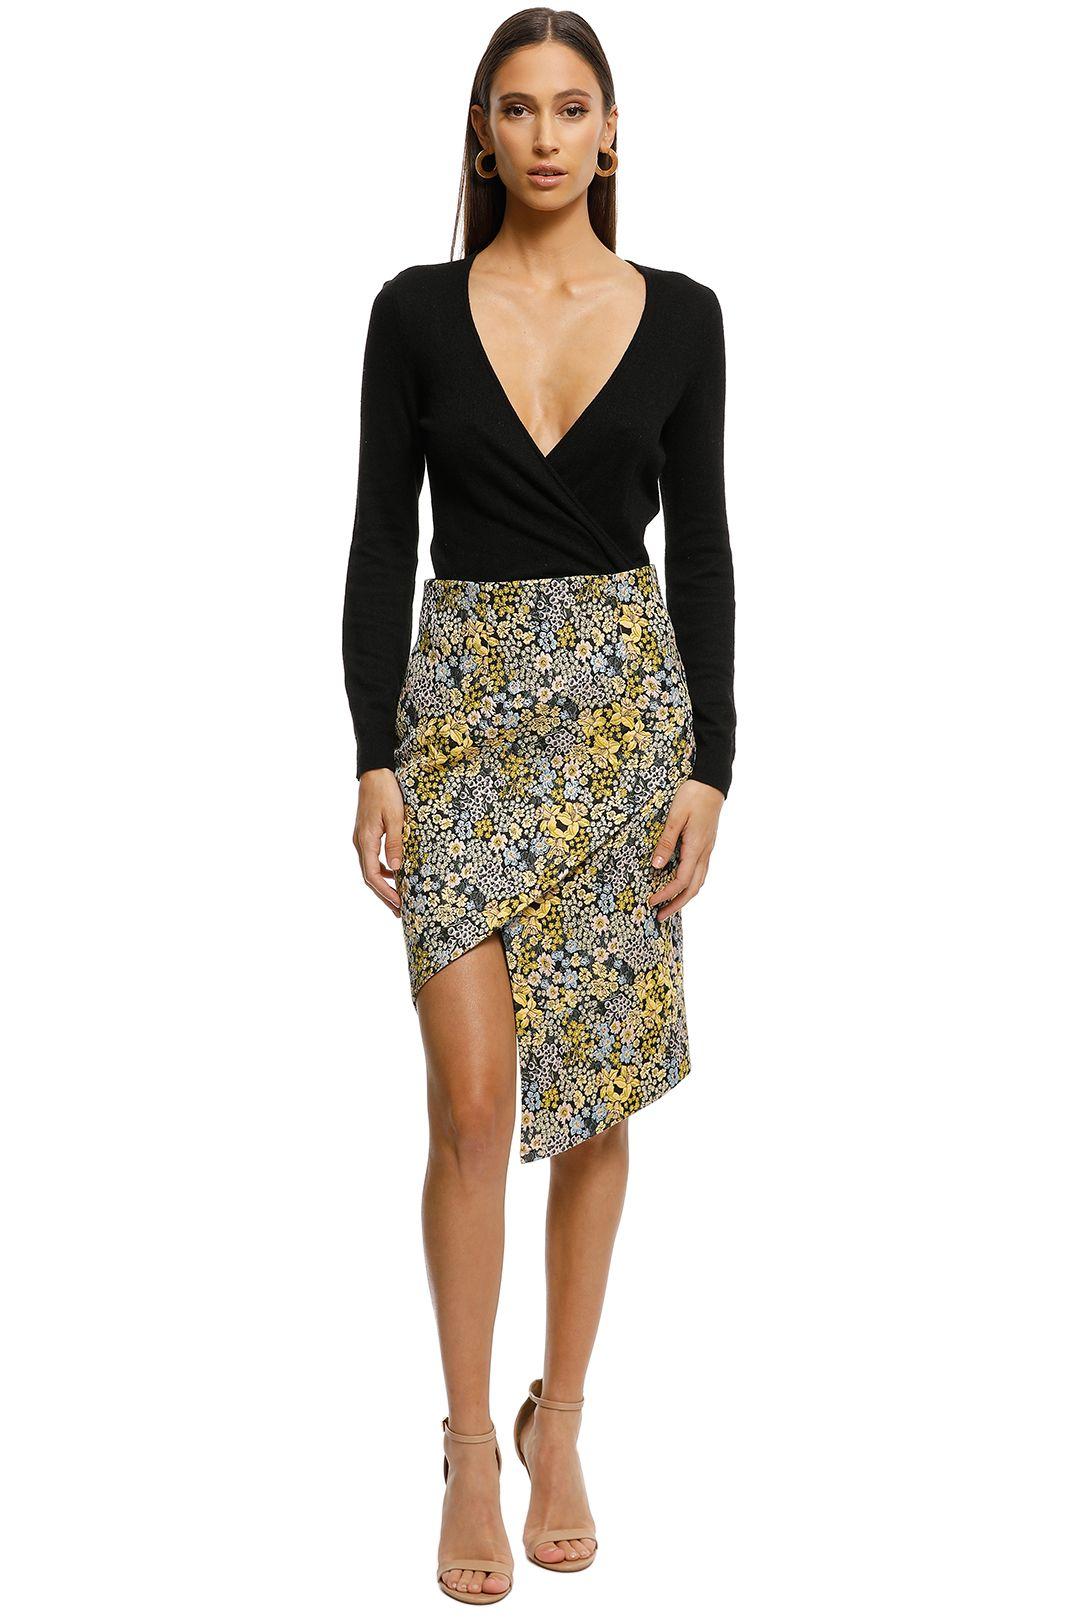 Elliatt-Alessia Skirt-Yellow-Front